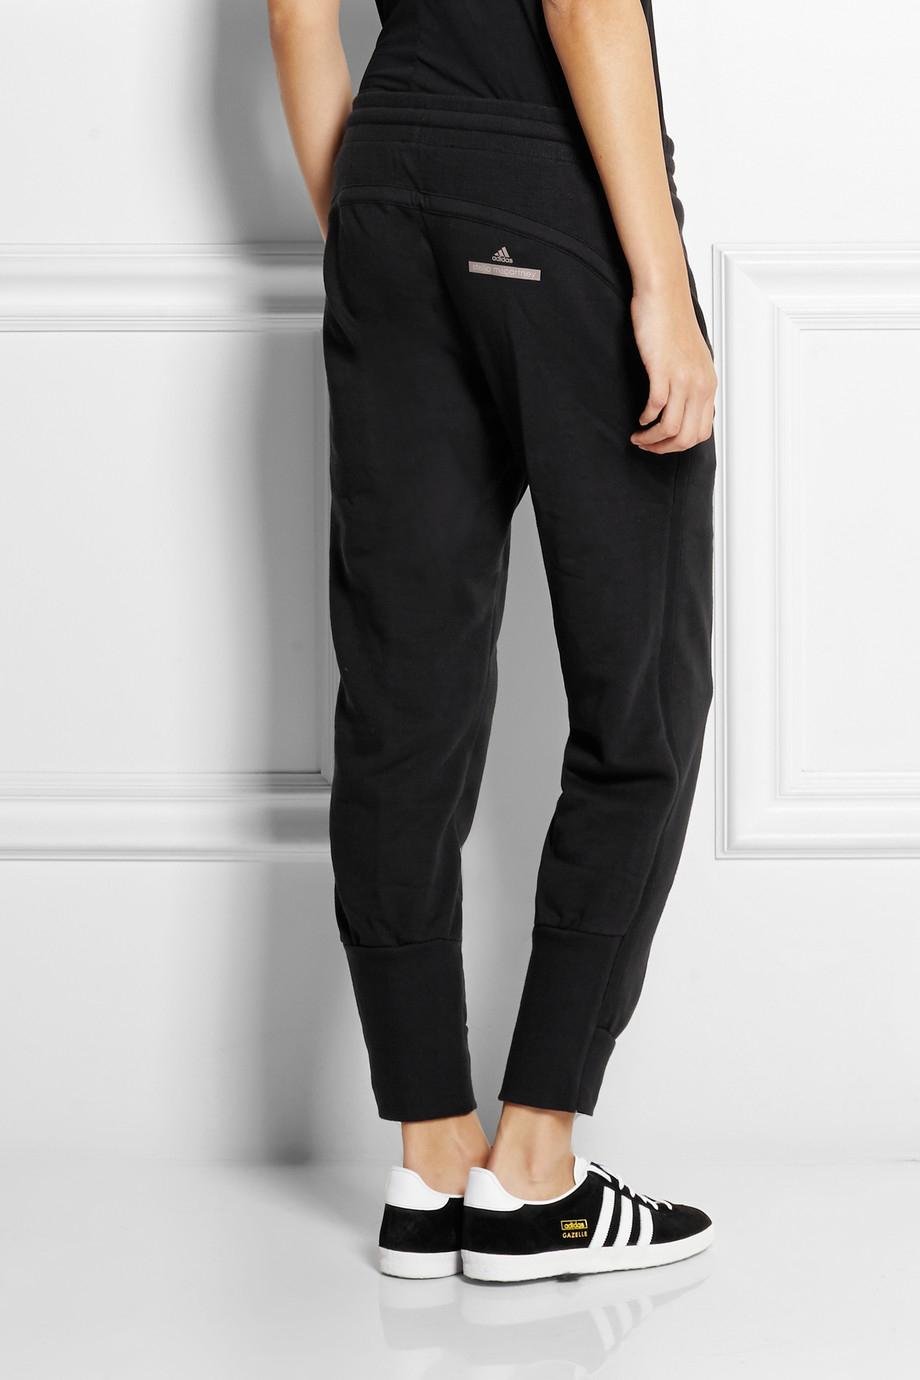 Adidas by Stella McCartney Essentials Lyst mezcla de algodón jersey